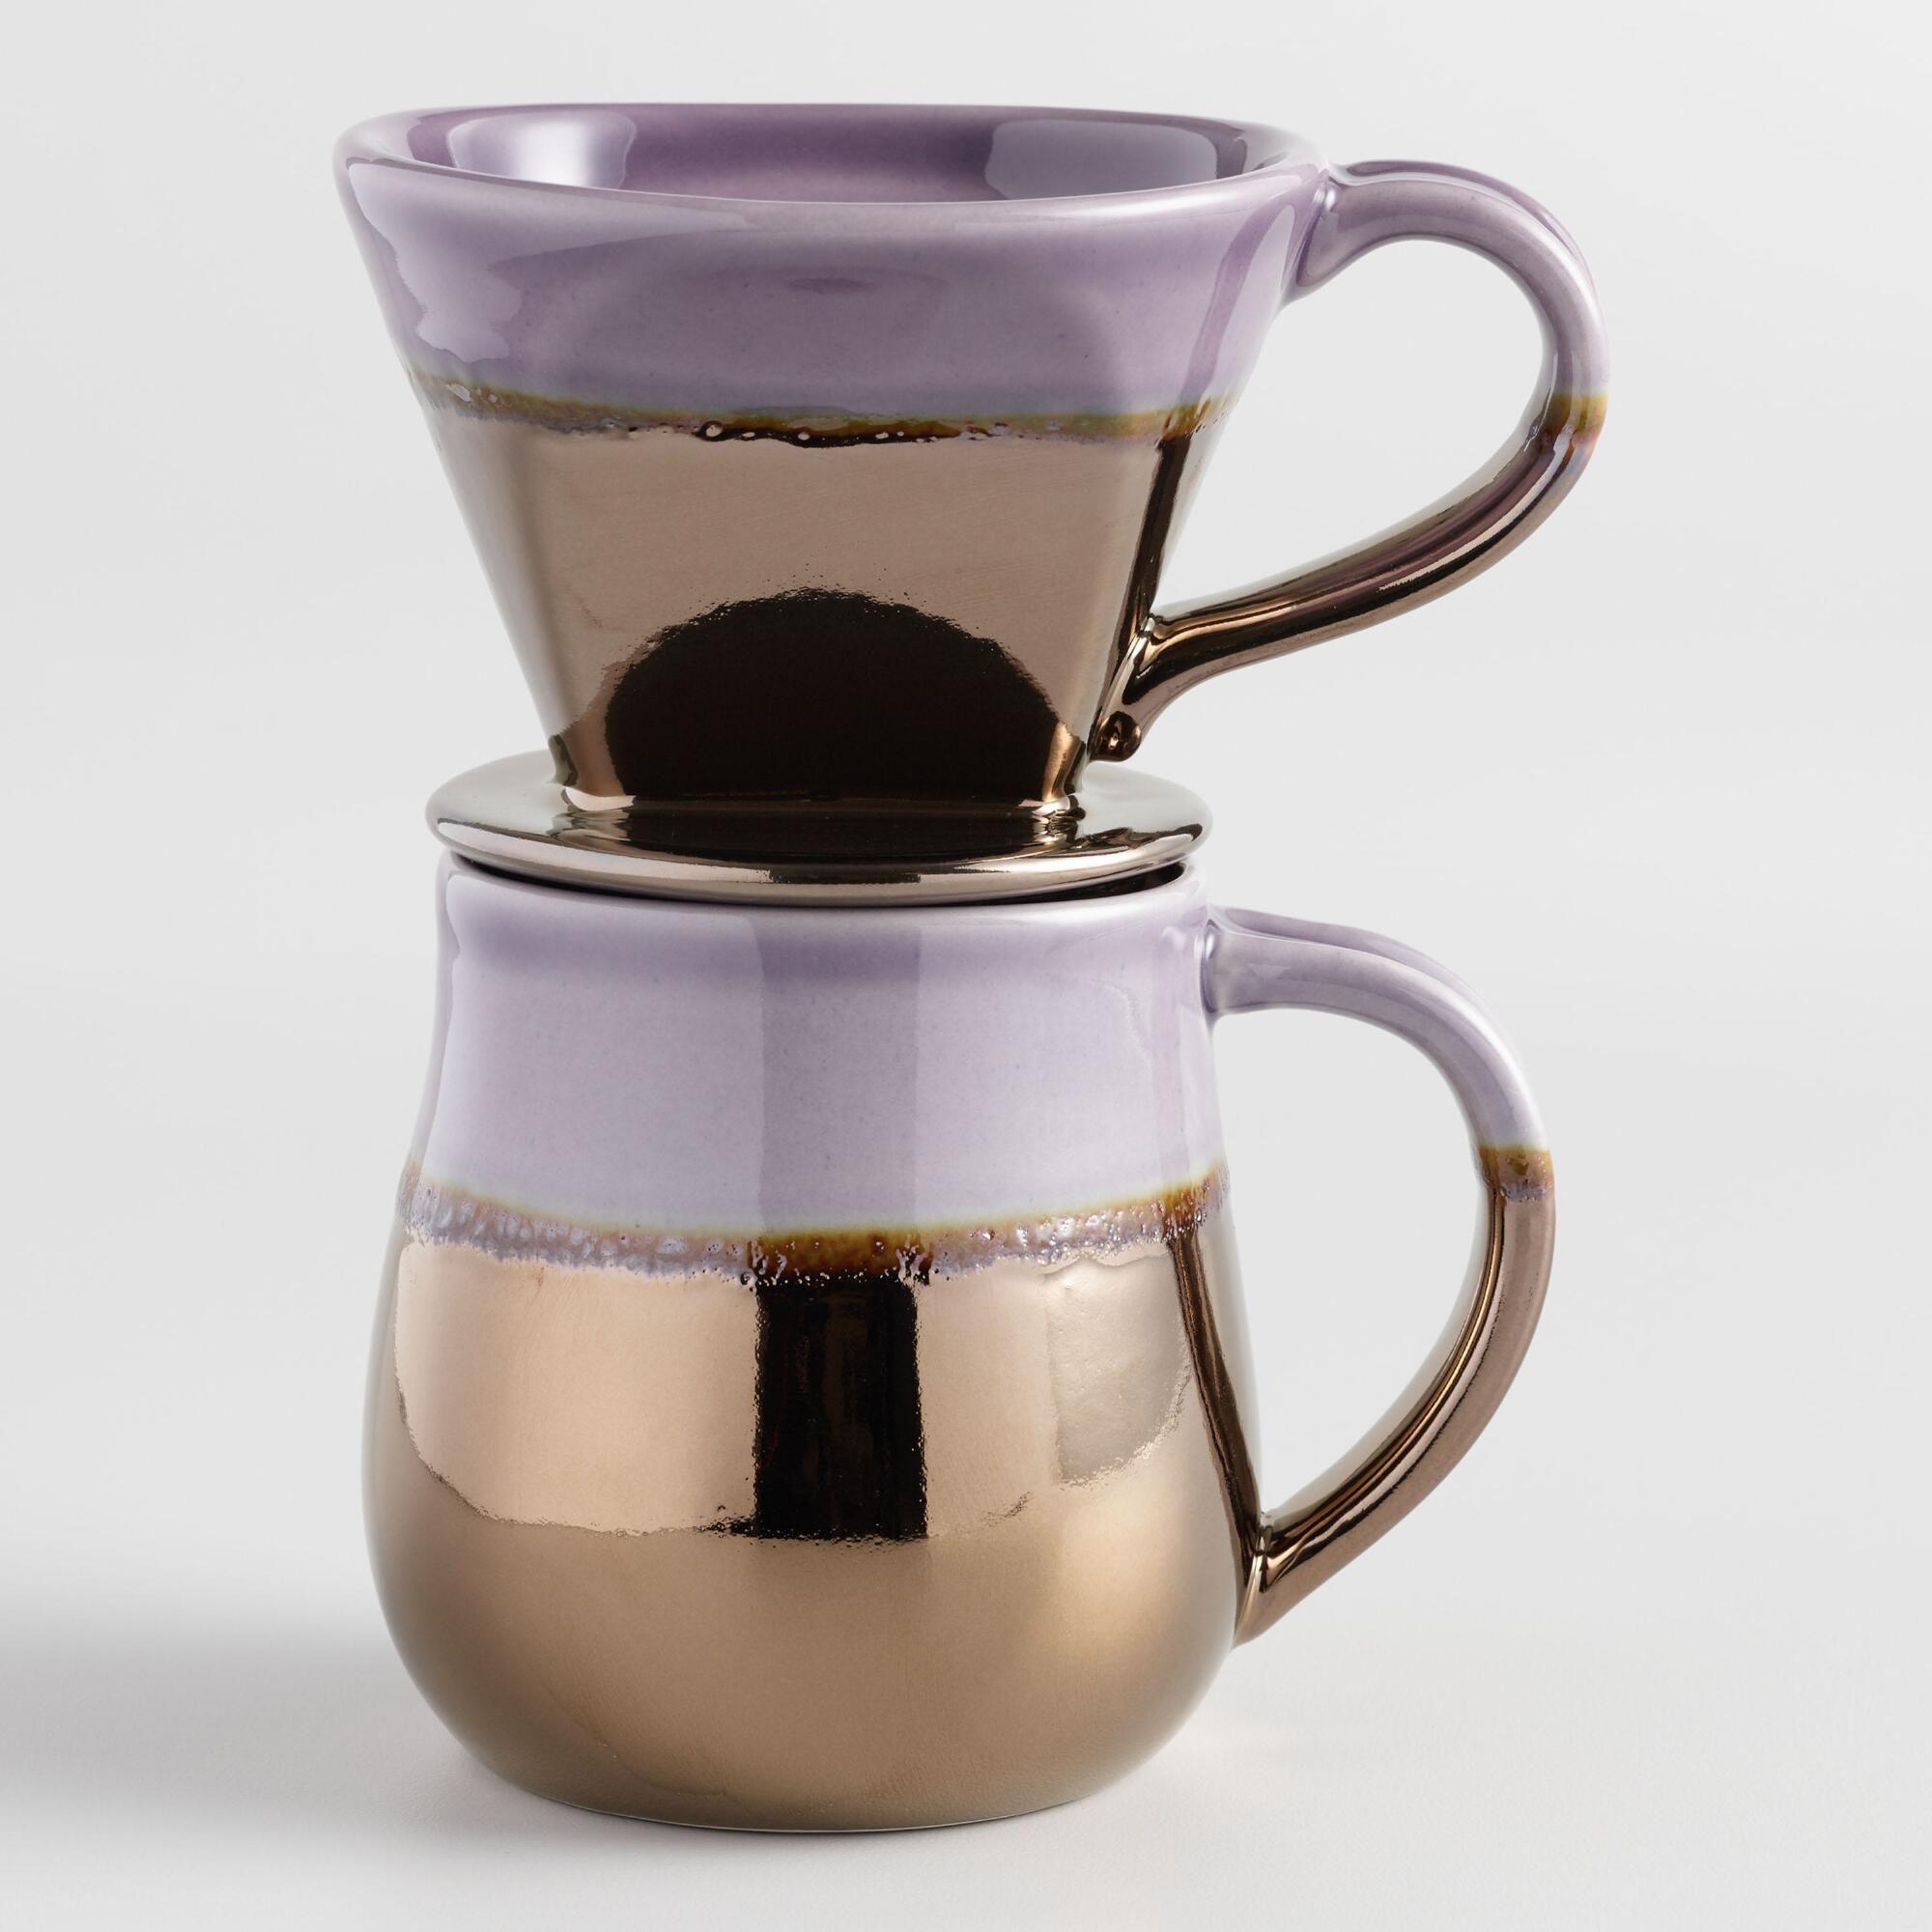 Metallic Ceramic Pour Over Coffee Mug Set By World Market